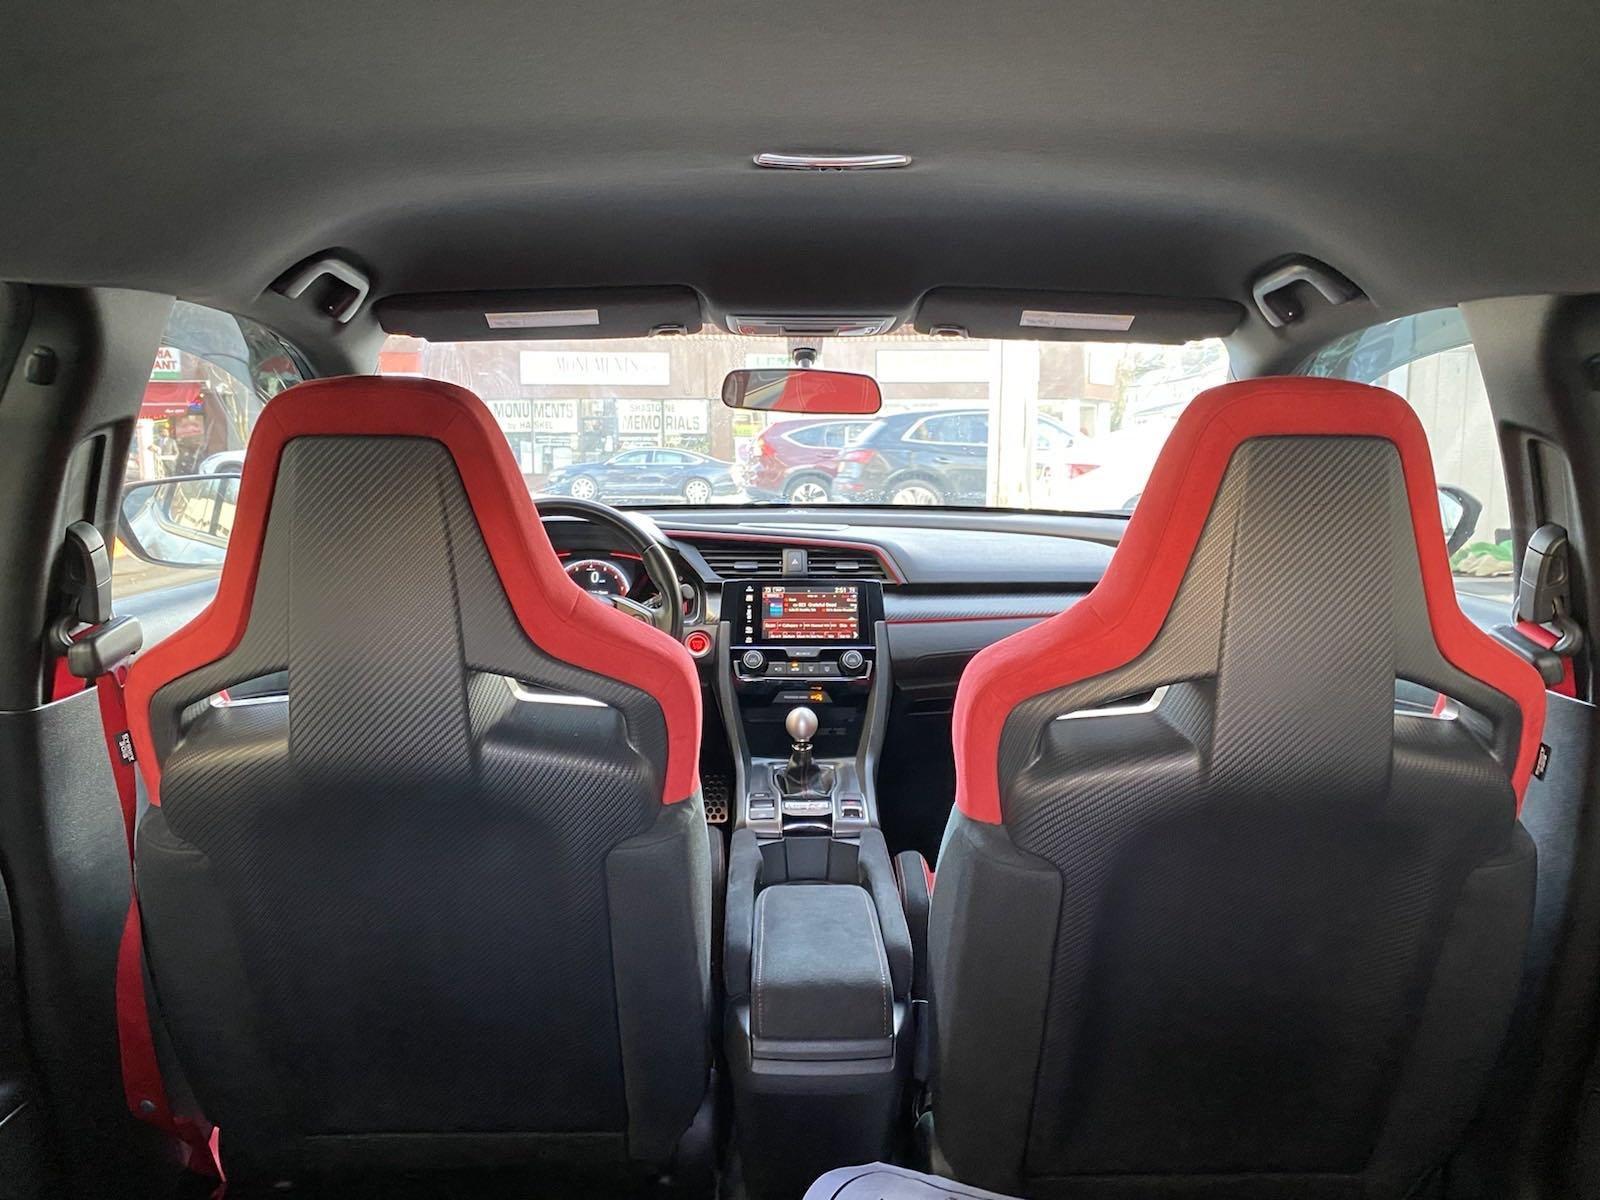 Used-2017-Honda-Civic-Type-R-Touring